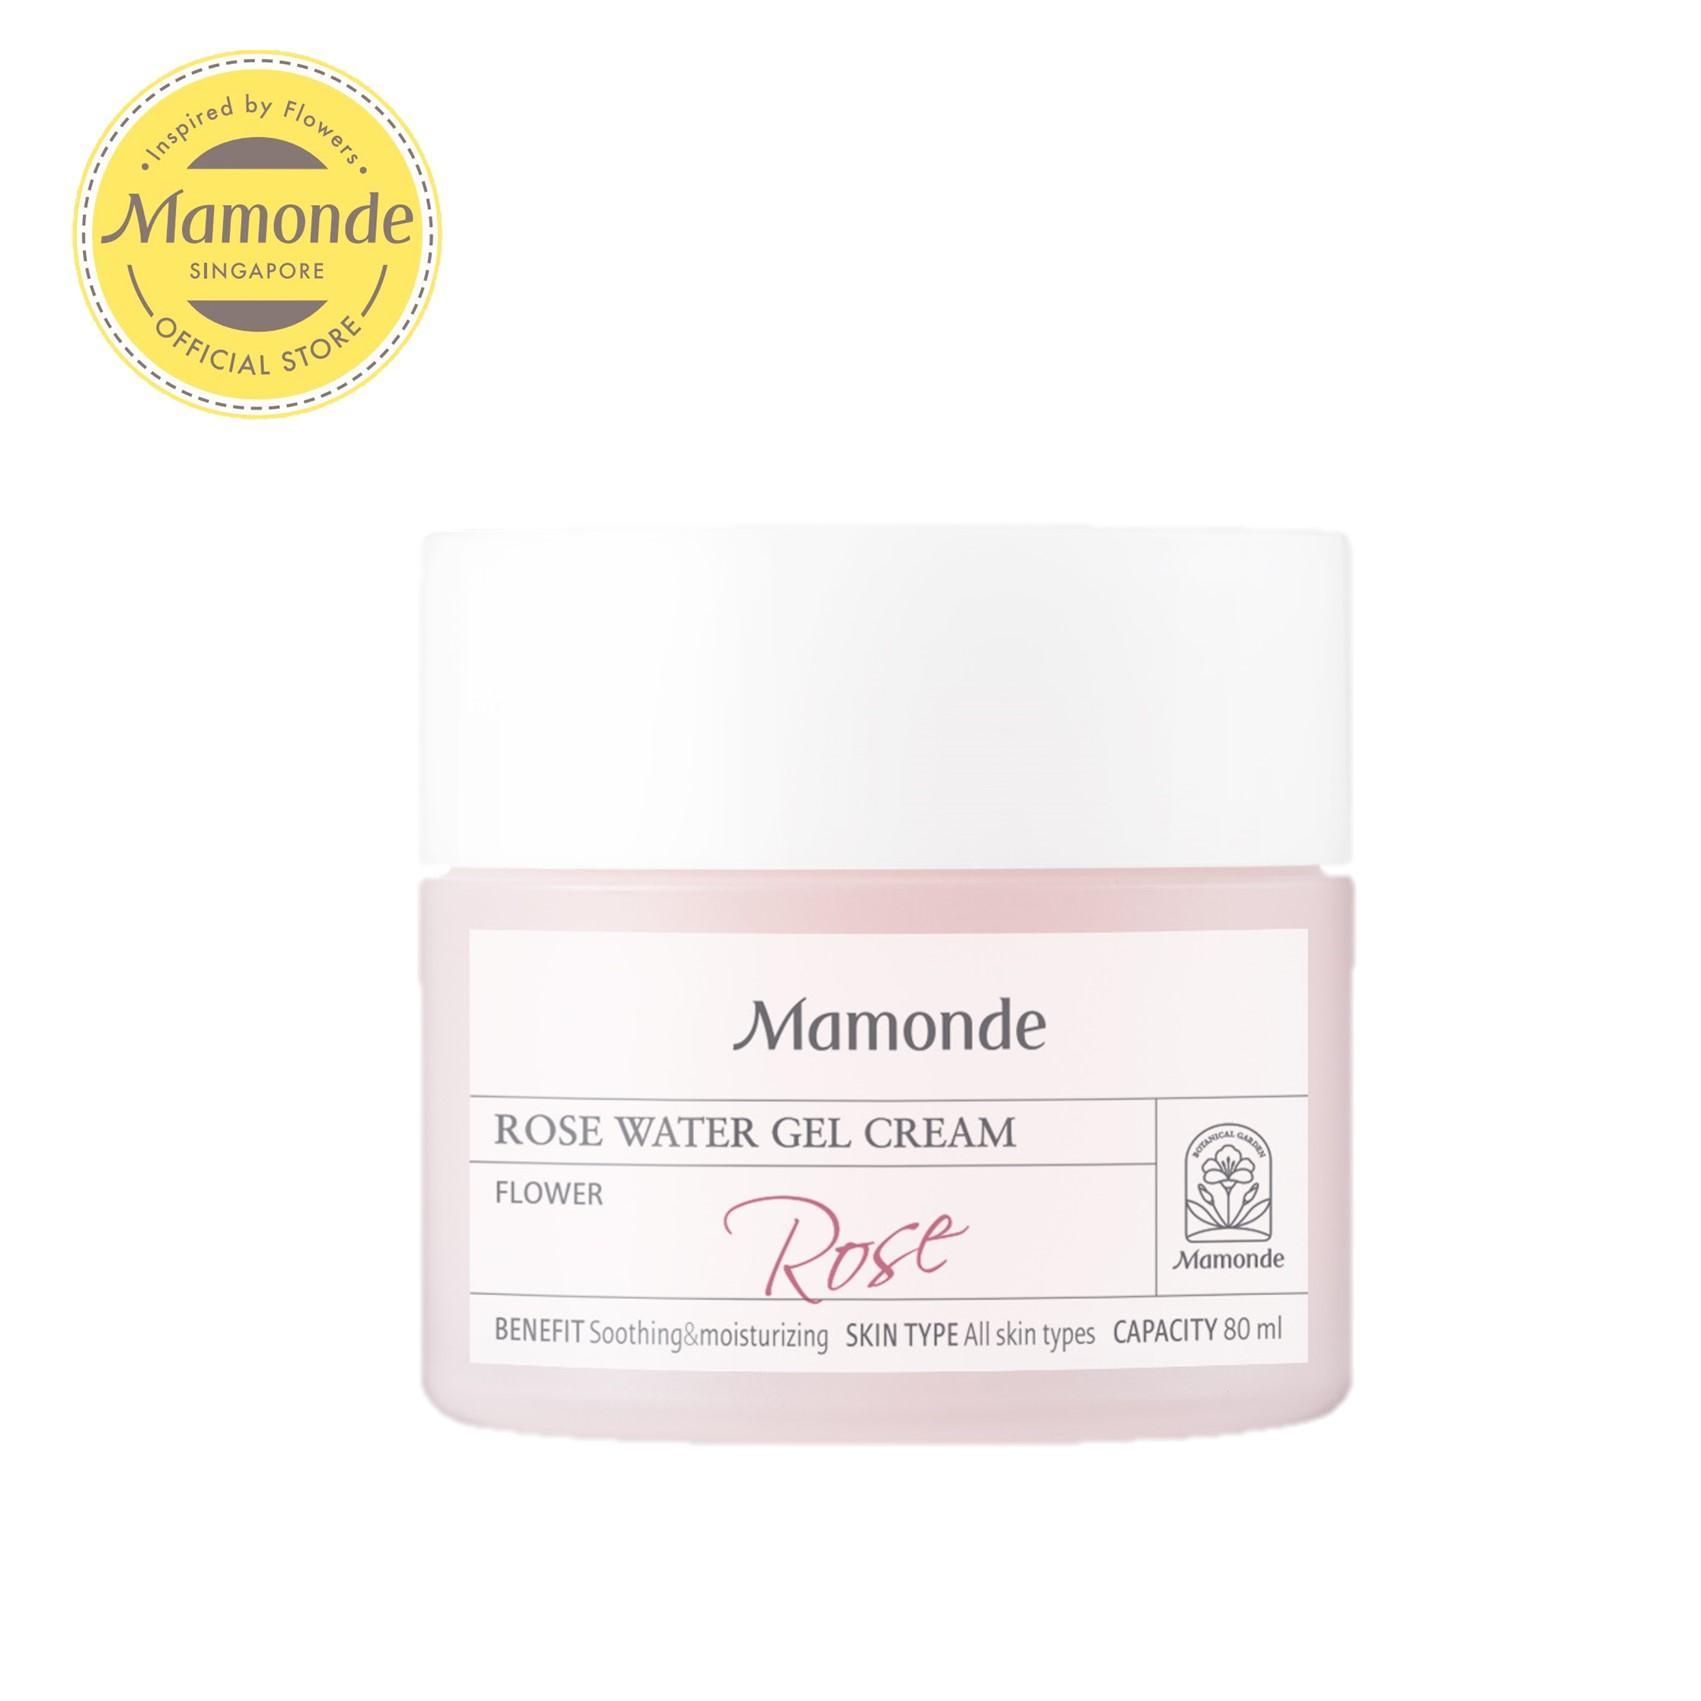 Mamonde Rose Water Gel Cream 80ml By Mamonde (capitaland Merchant).